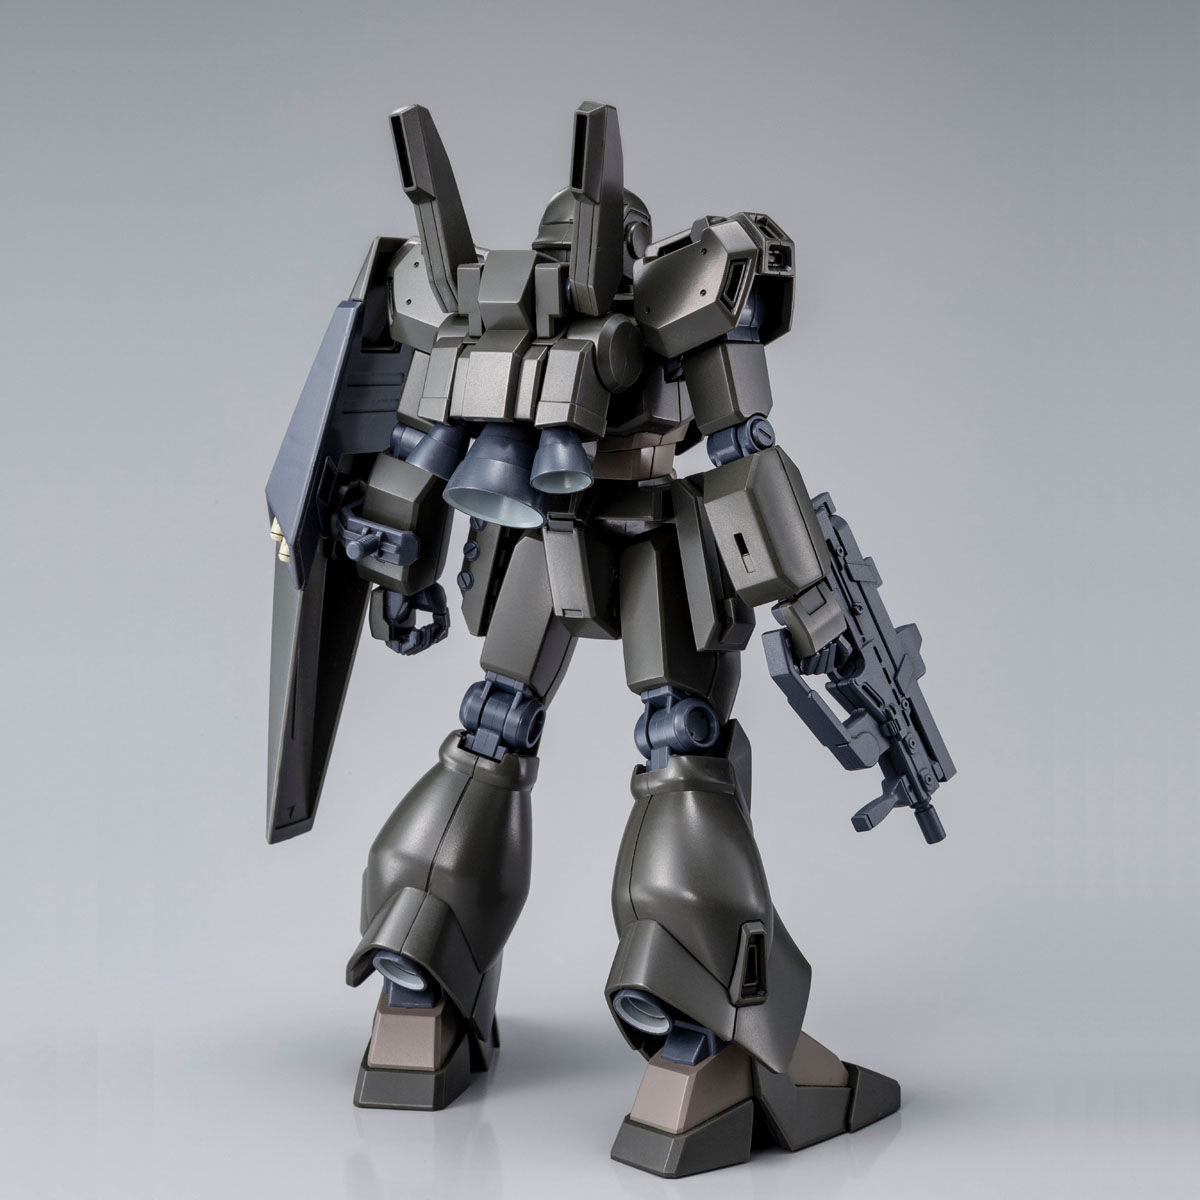 HG 1/144『ジェガンD型 (護衛隊仕様)』機動戦士ガンダムNT プラモデル-003